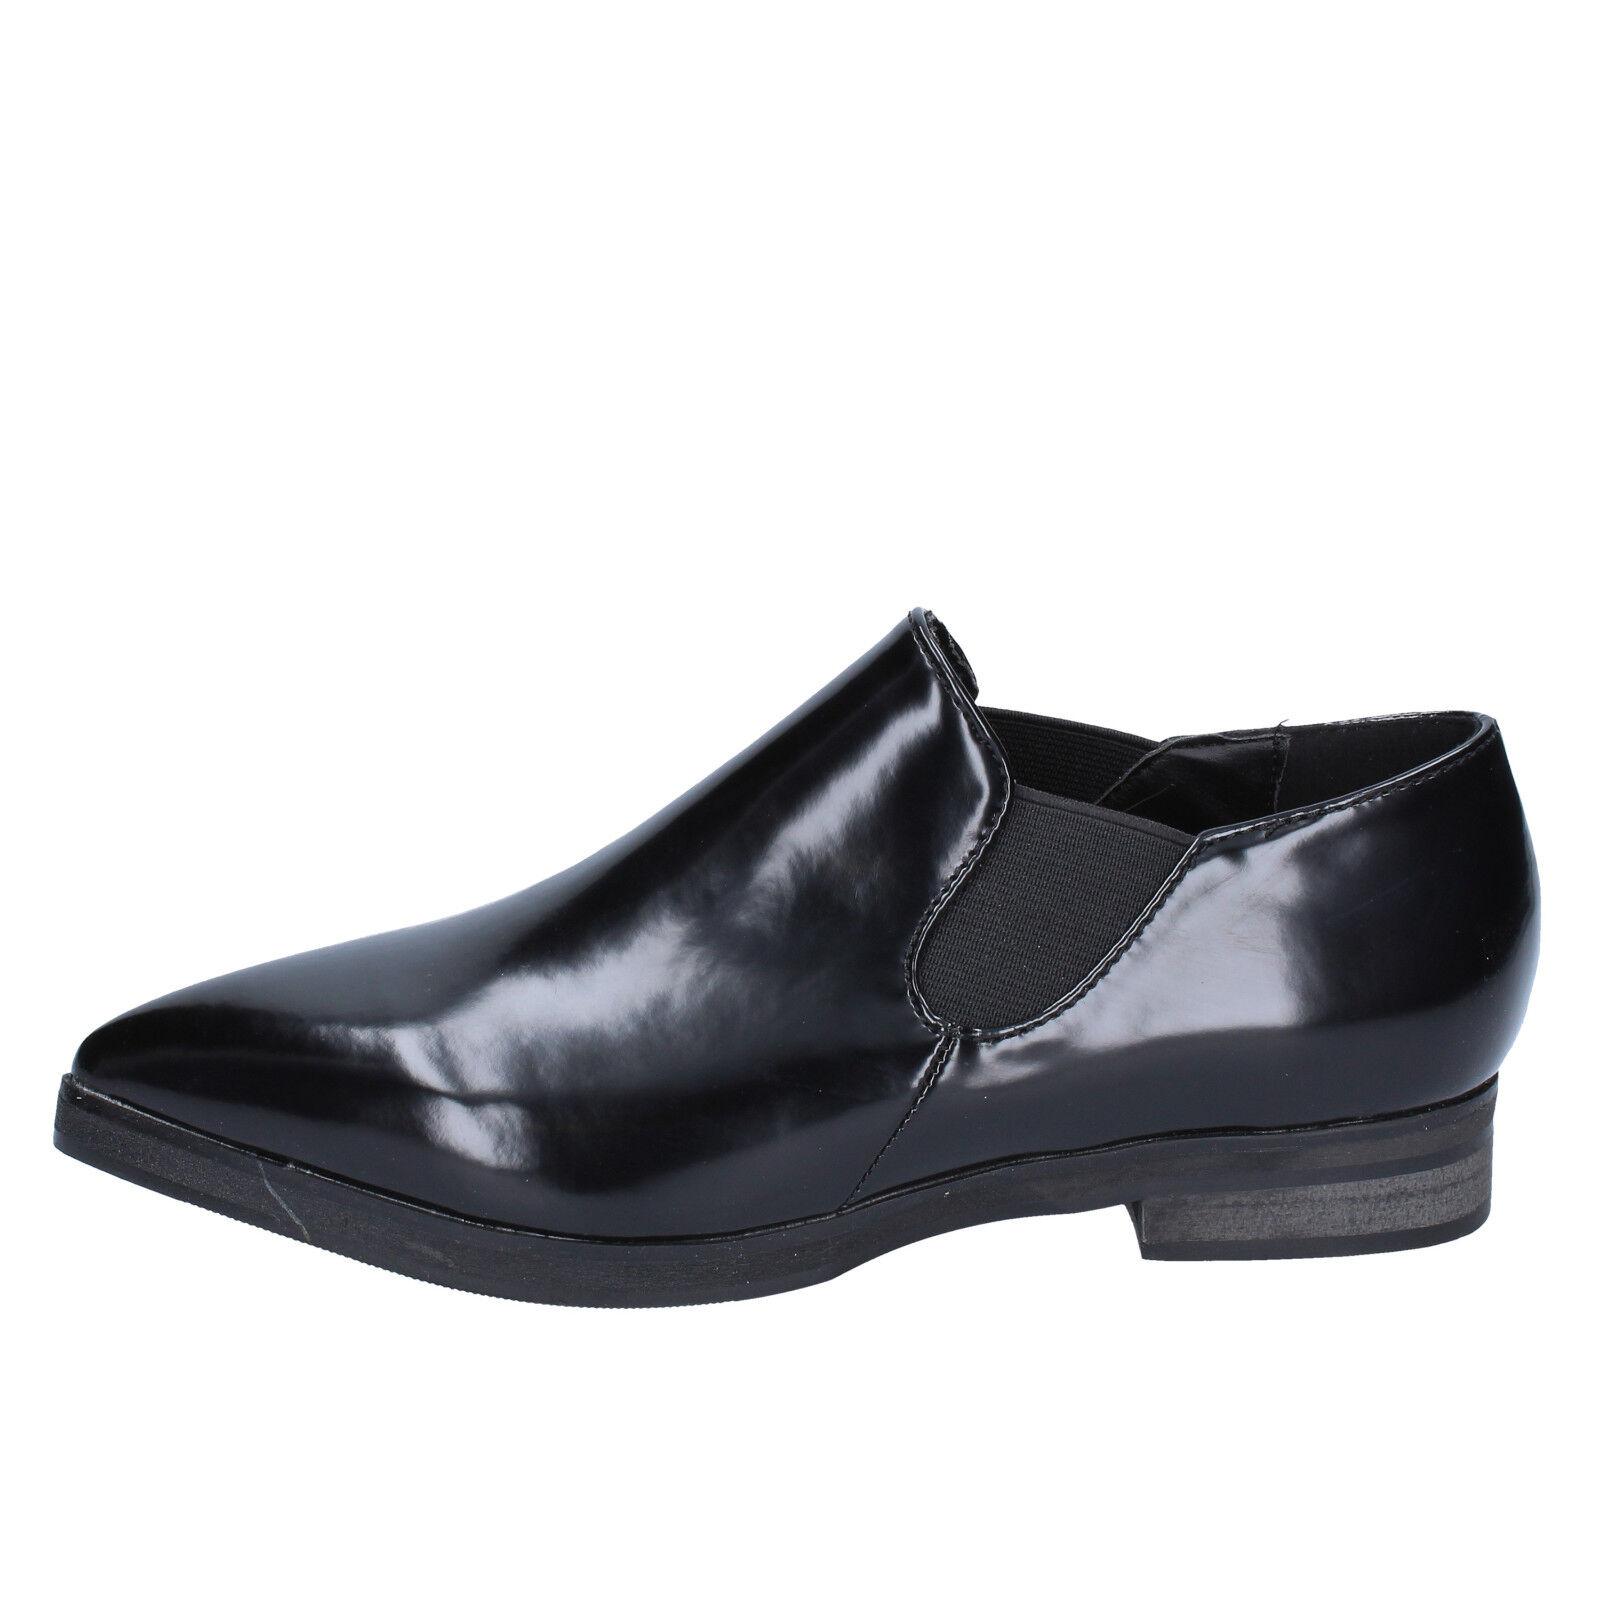 scarpe donna FRANCESCO MILANO 37 slip on nero pelle BX327-37